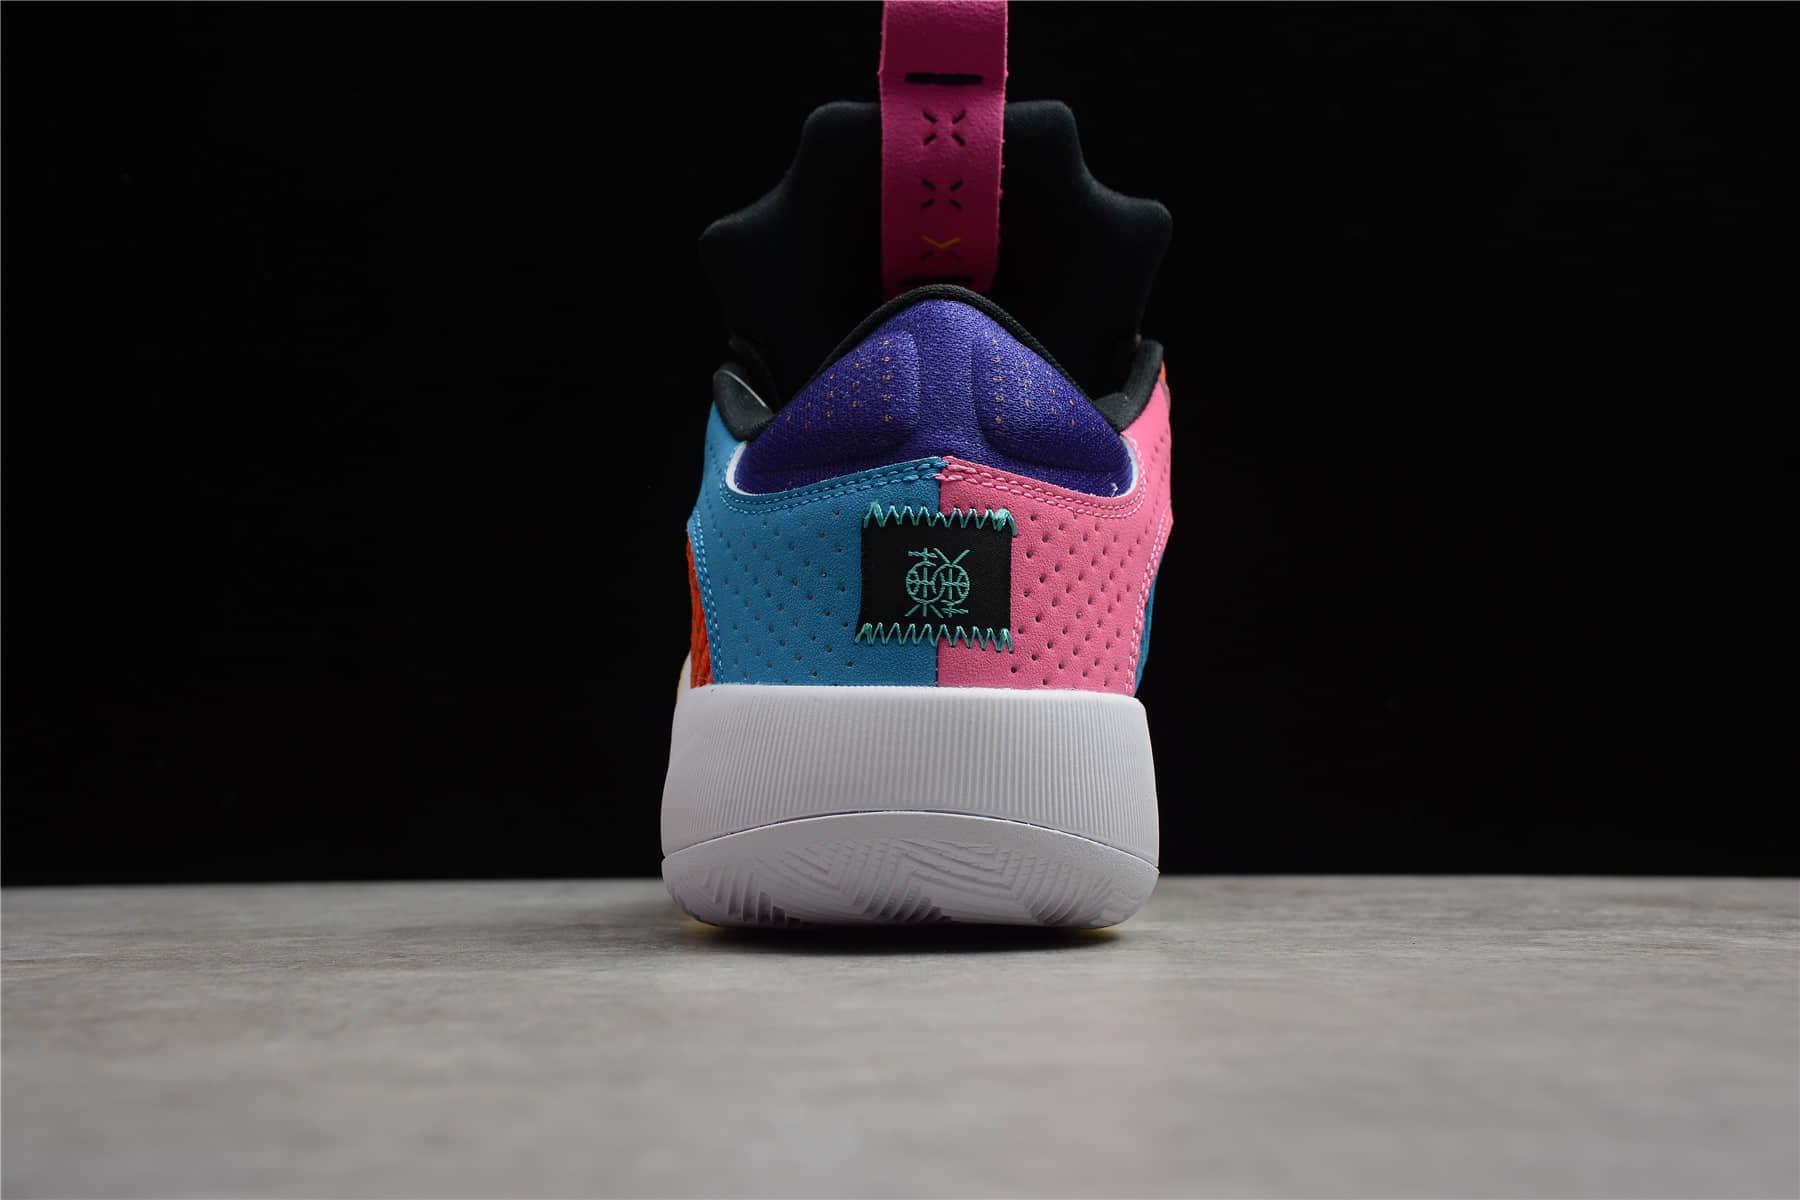 "AJ35东单篮球鞋 AJ35Air Jordan 35 Low ""Reflexology"" AJ35实战篮球鞋 AJ反光球鞋 货号: DJ2831-300-潮流者之家"